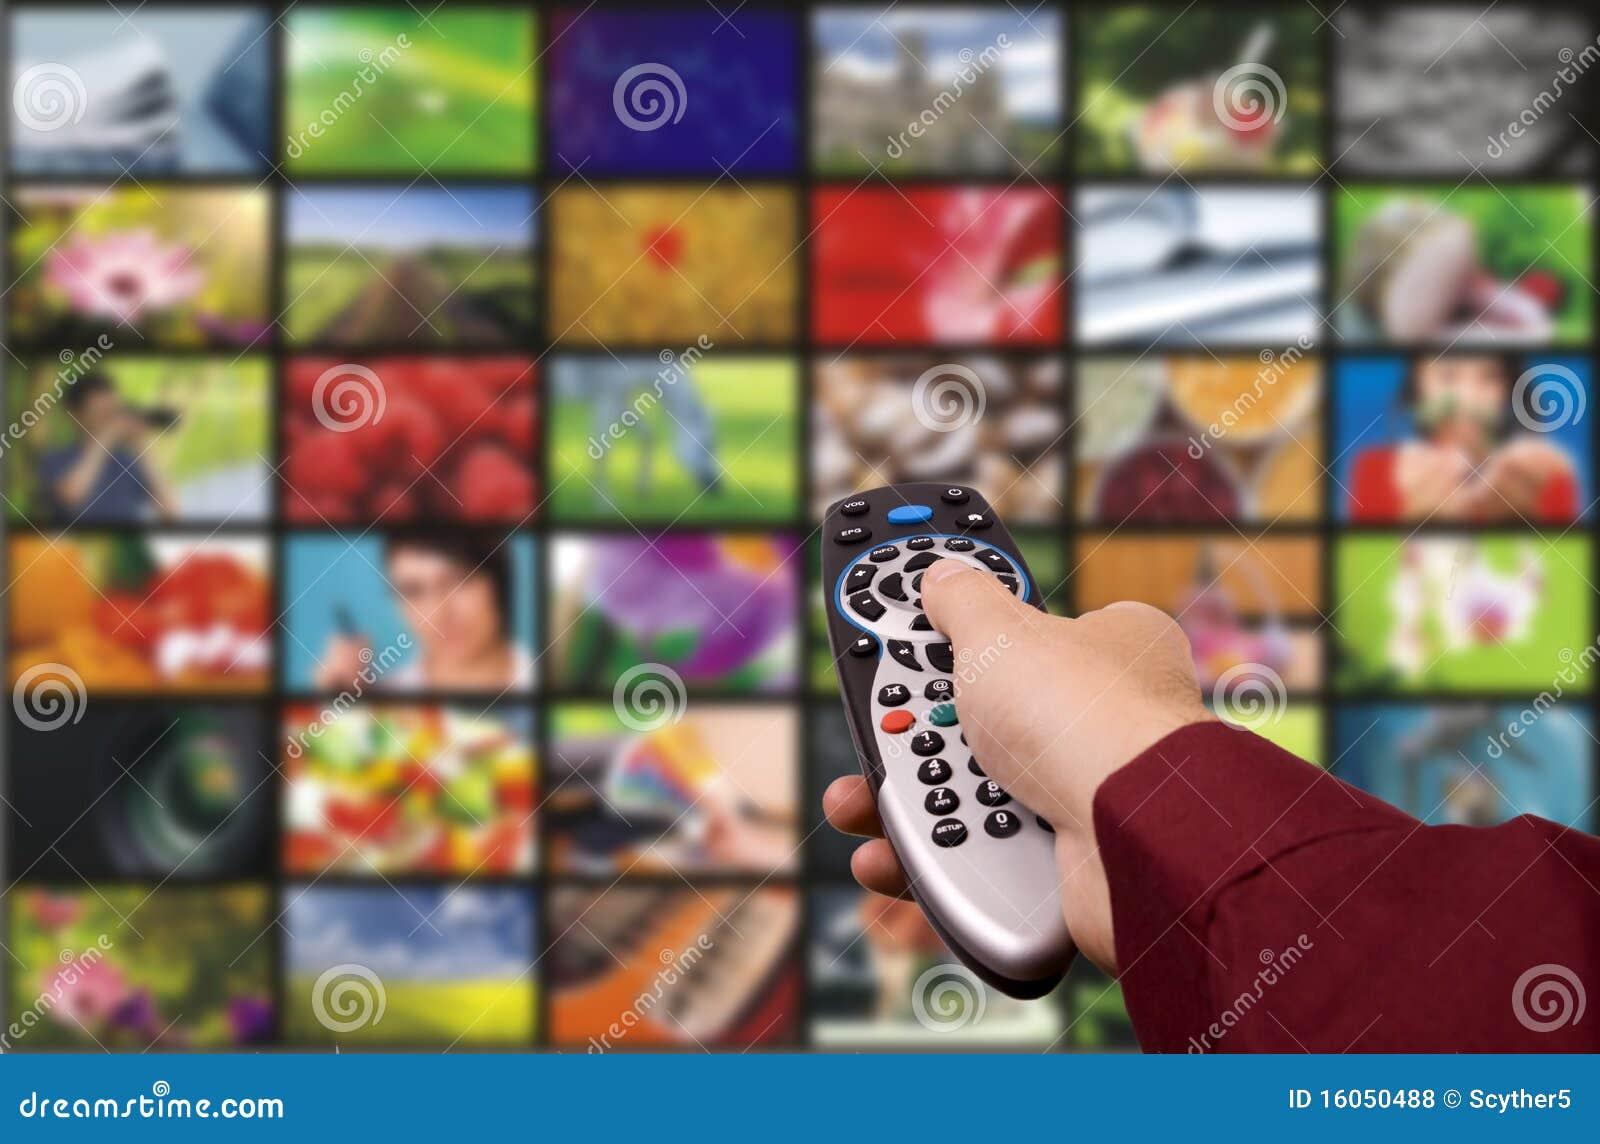 Digital television. Remote control.